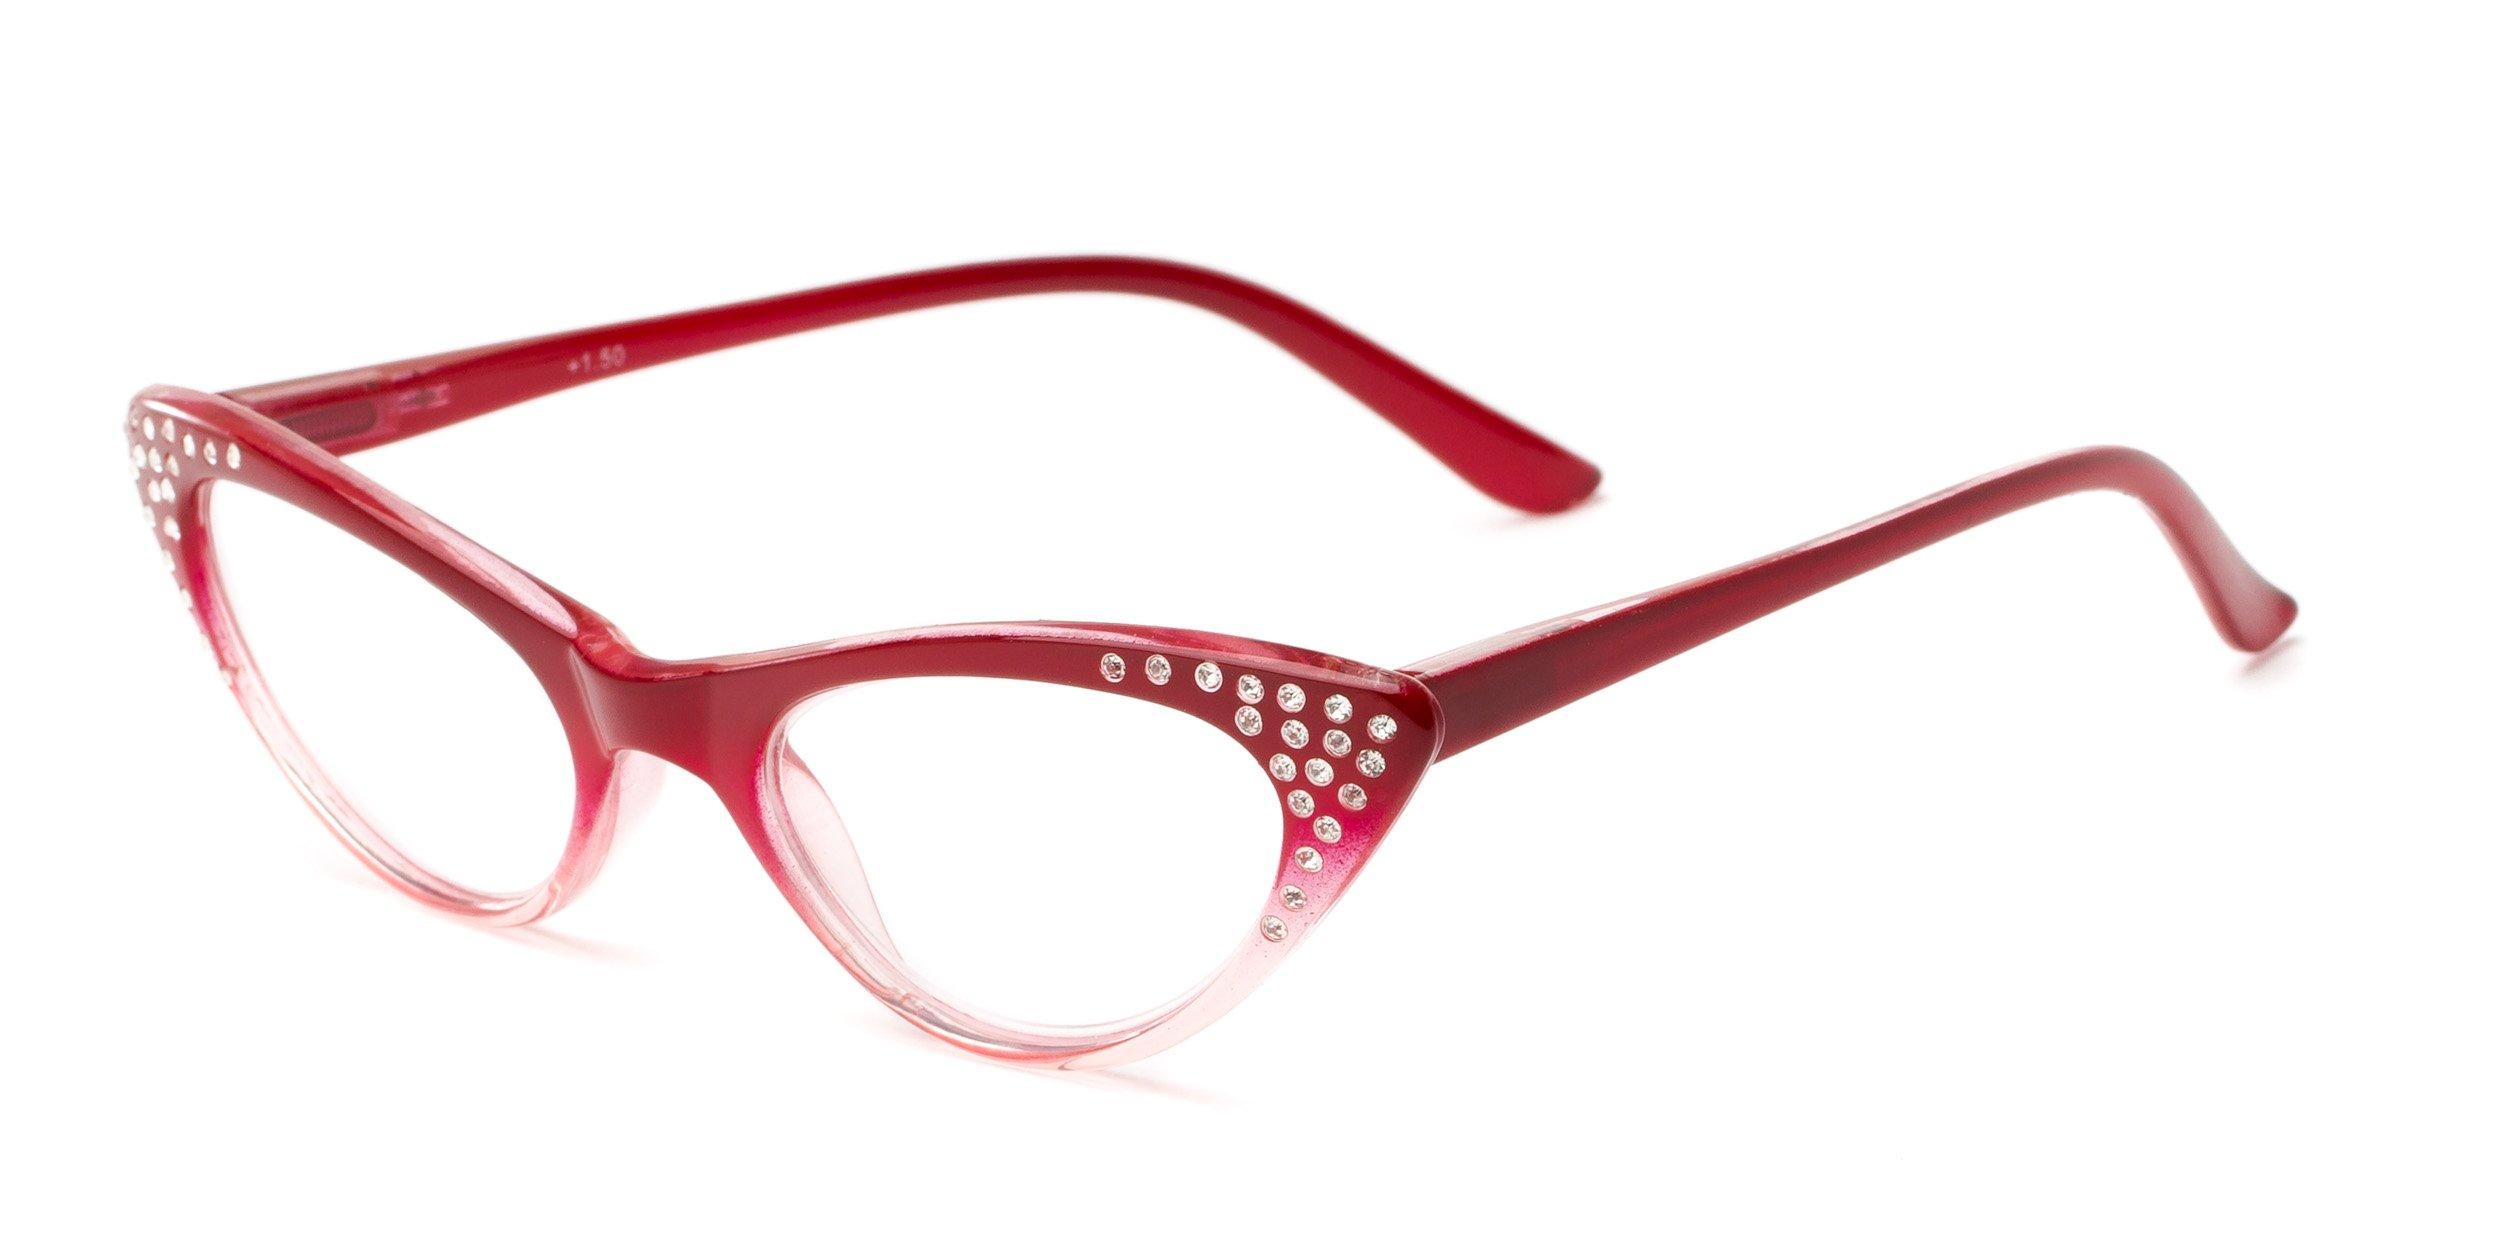 Readers.com Reading Glasses: The Paulina Reader, Plastic Cat Eye Style for Women